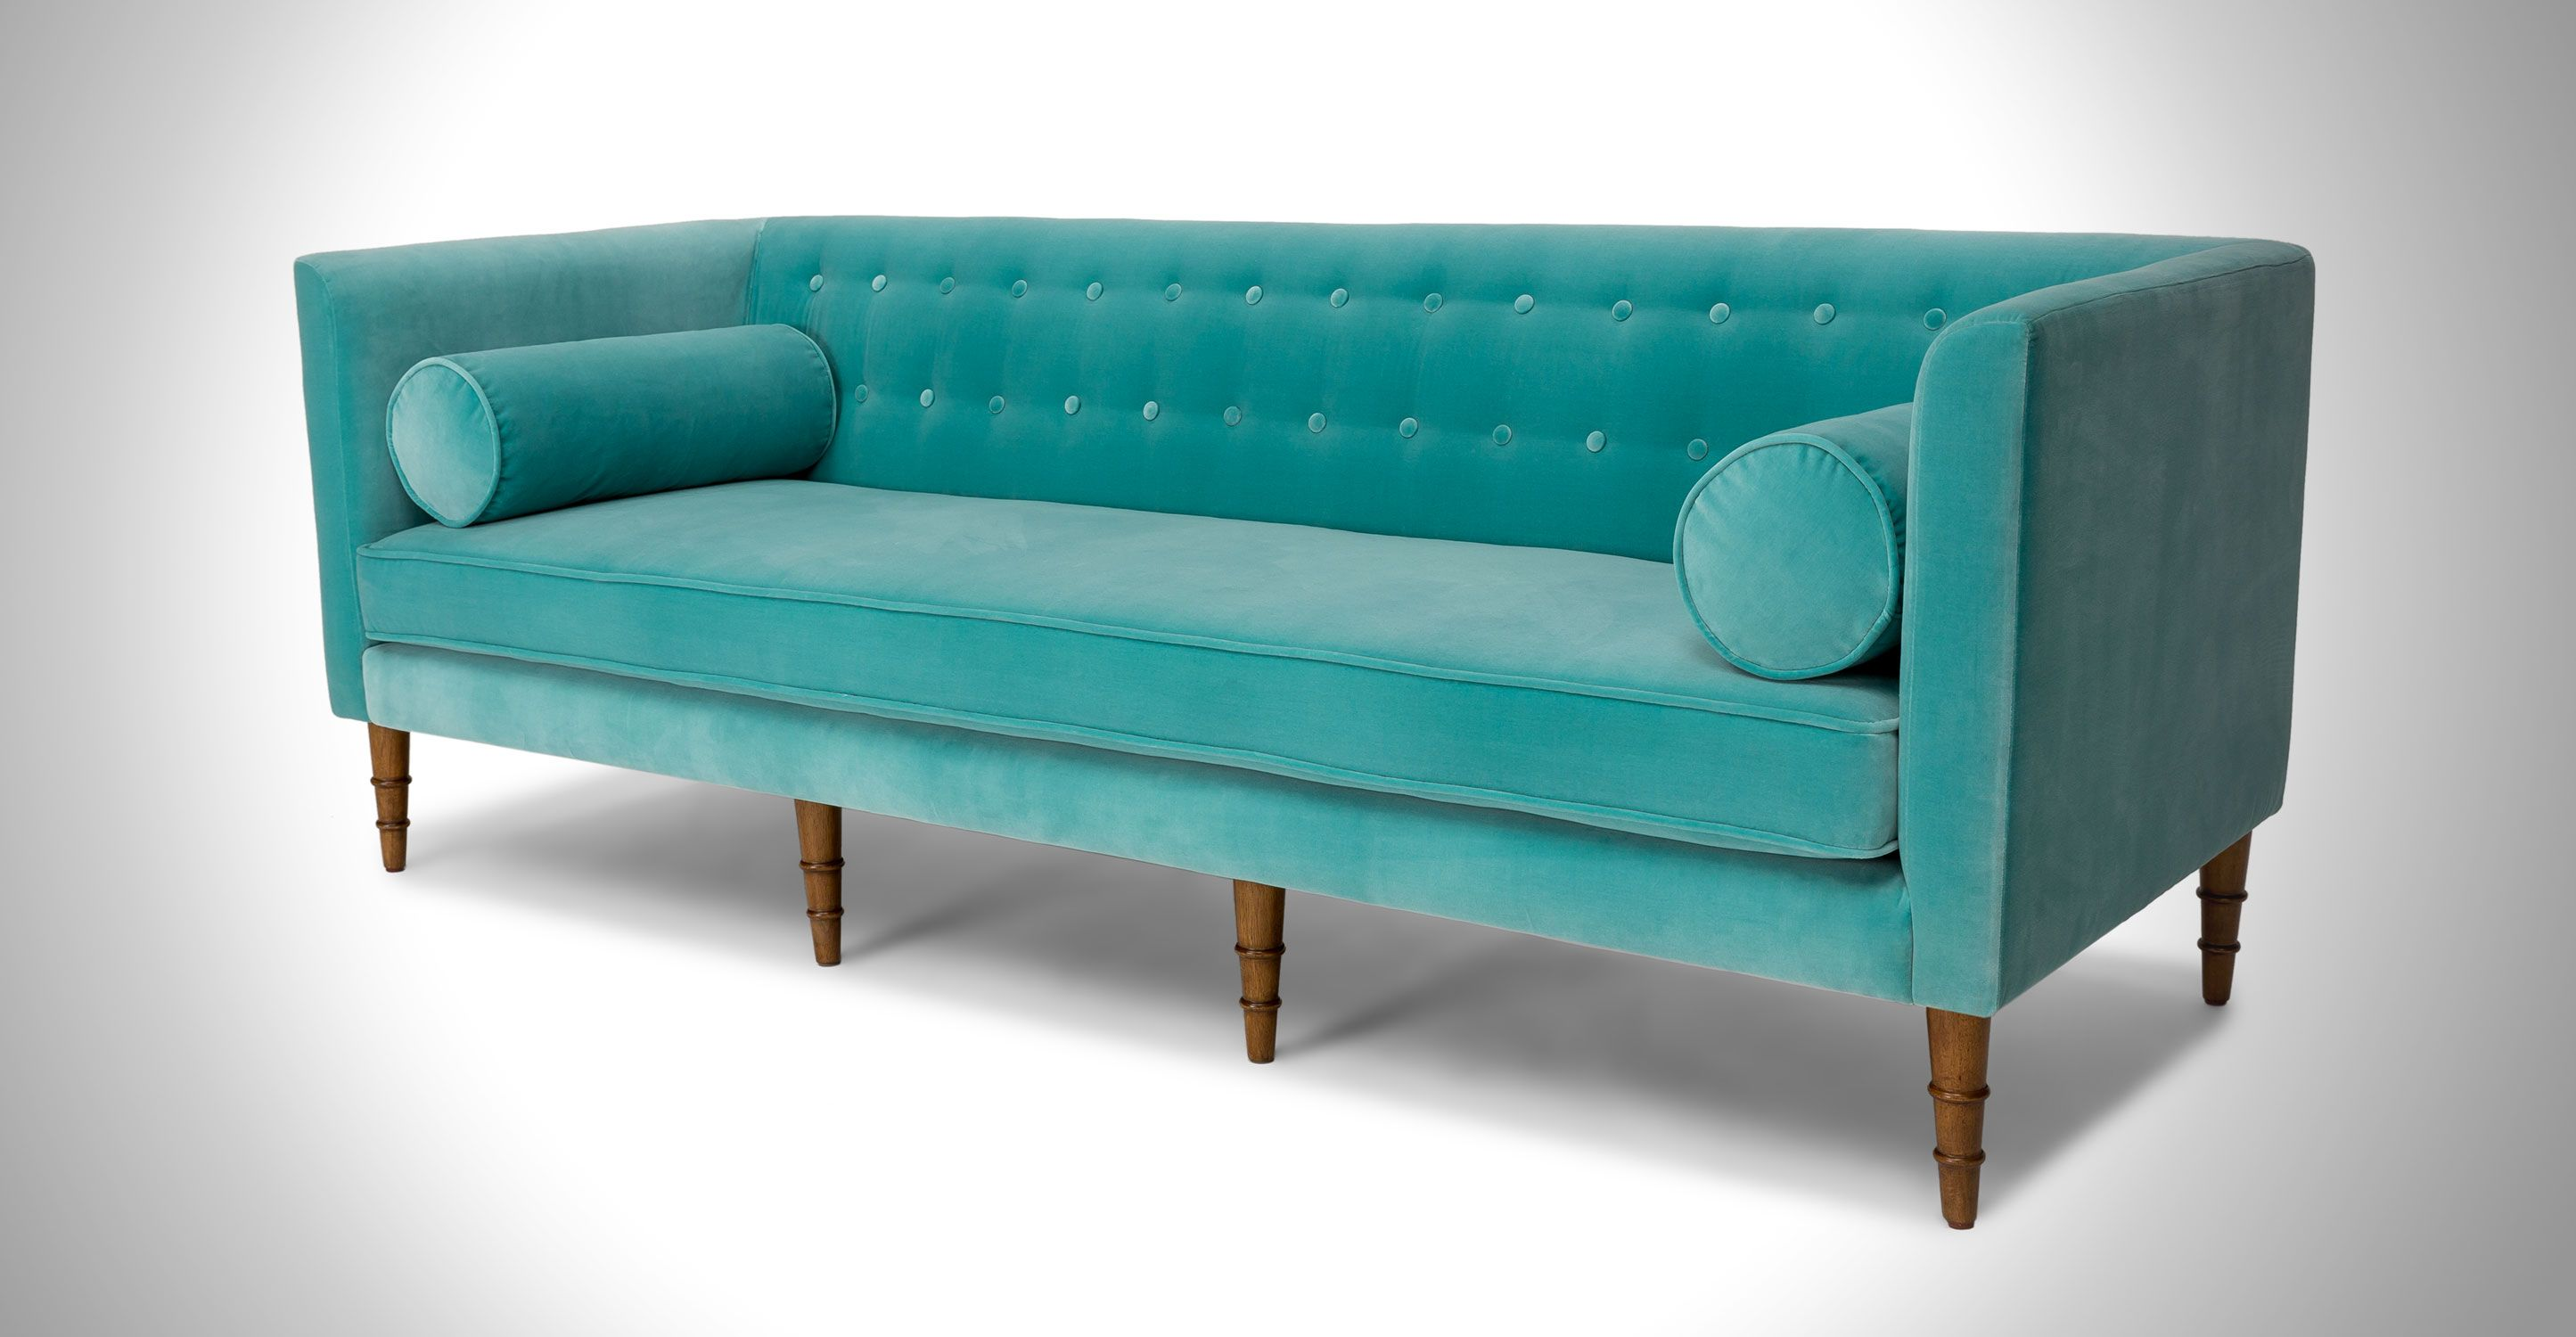 Groovy Celosia Oahu Aqua Sofa Home Updates Futon Sofa Gray Machost Co Dining Chair Design Ideas Machostcouk